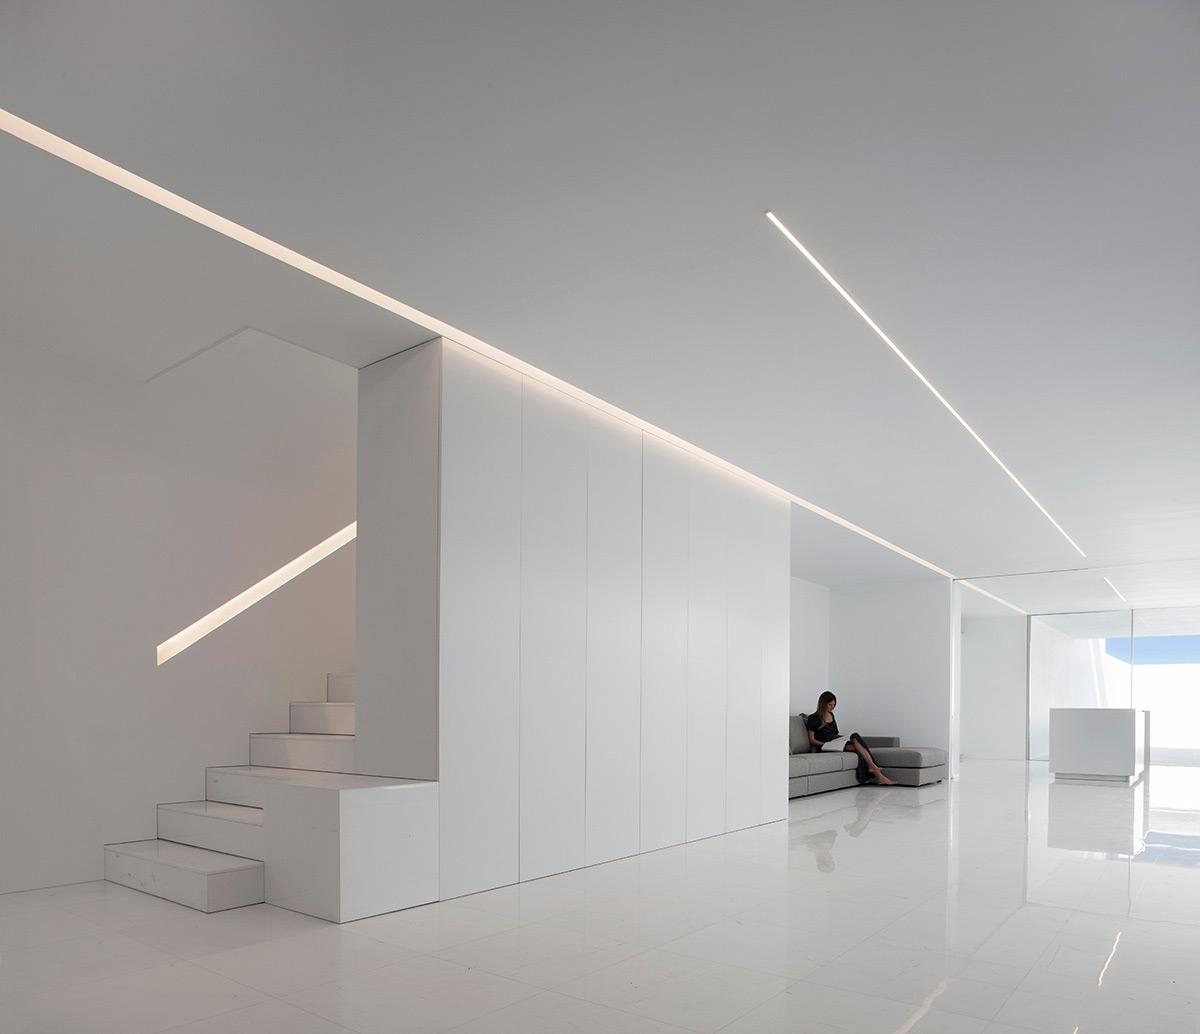 Casa-Pati-Blau-Fran-Silvestre-Arquitectos-Diego-Opazo-06